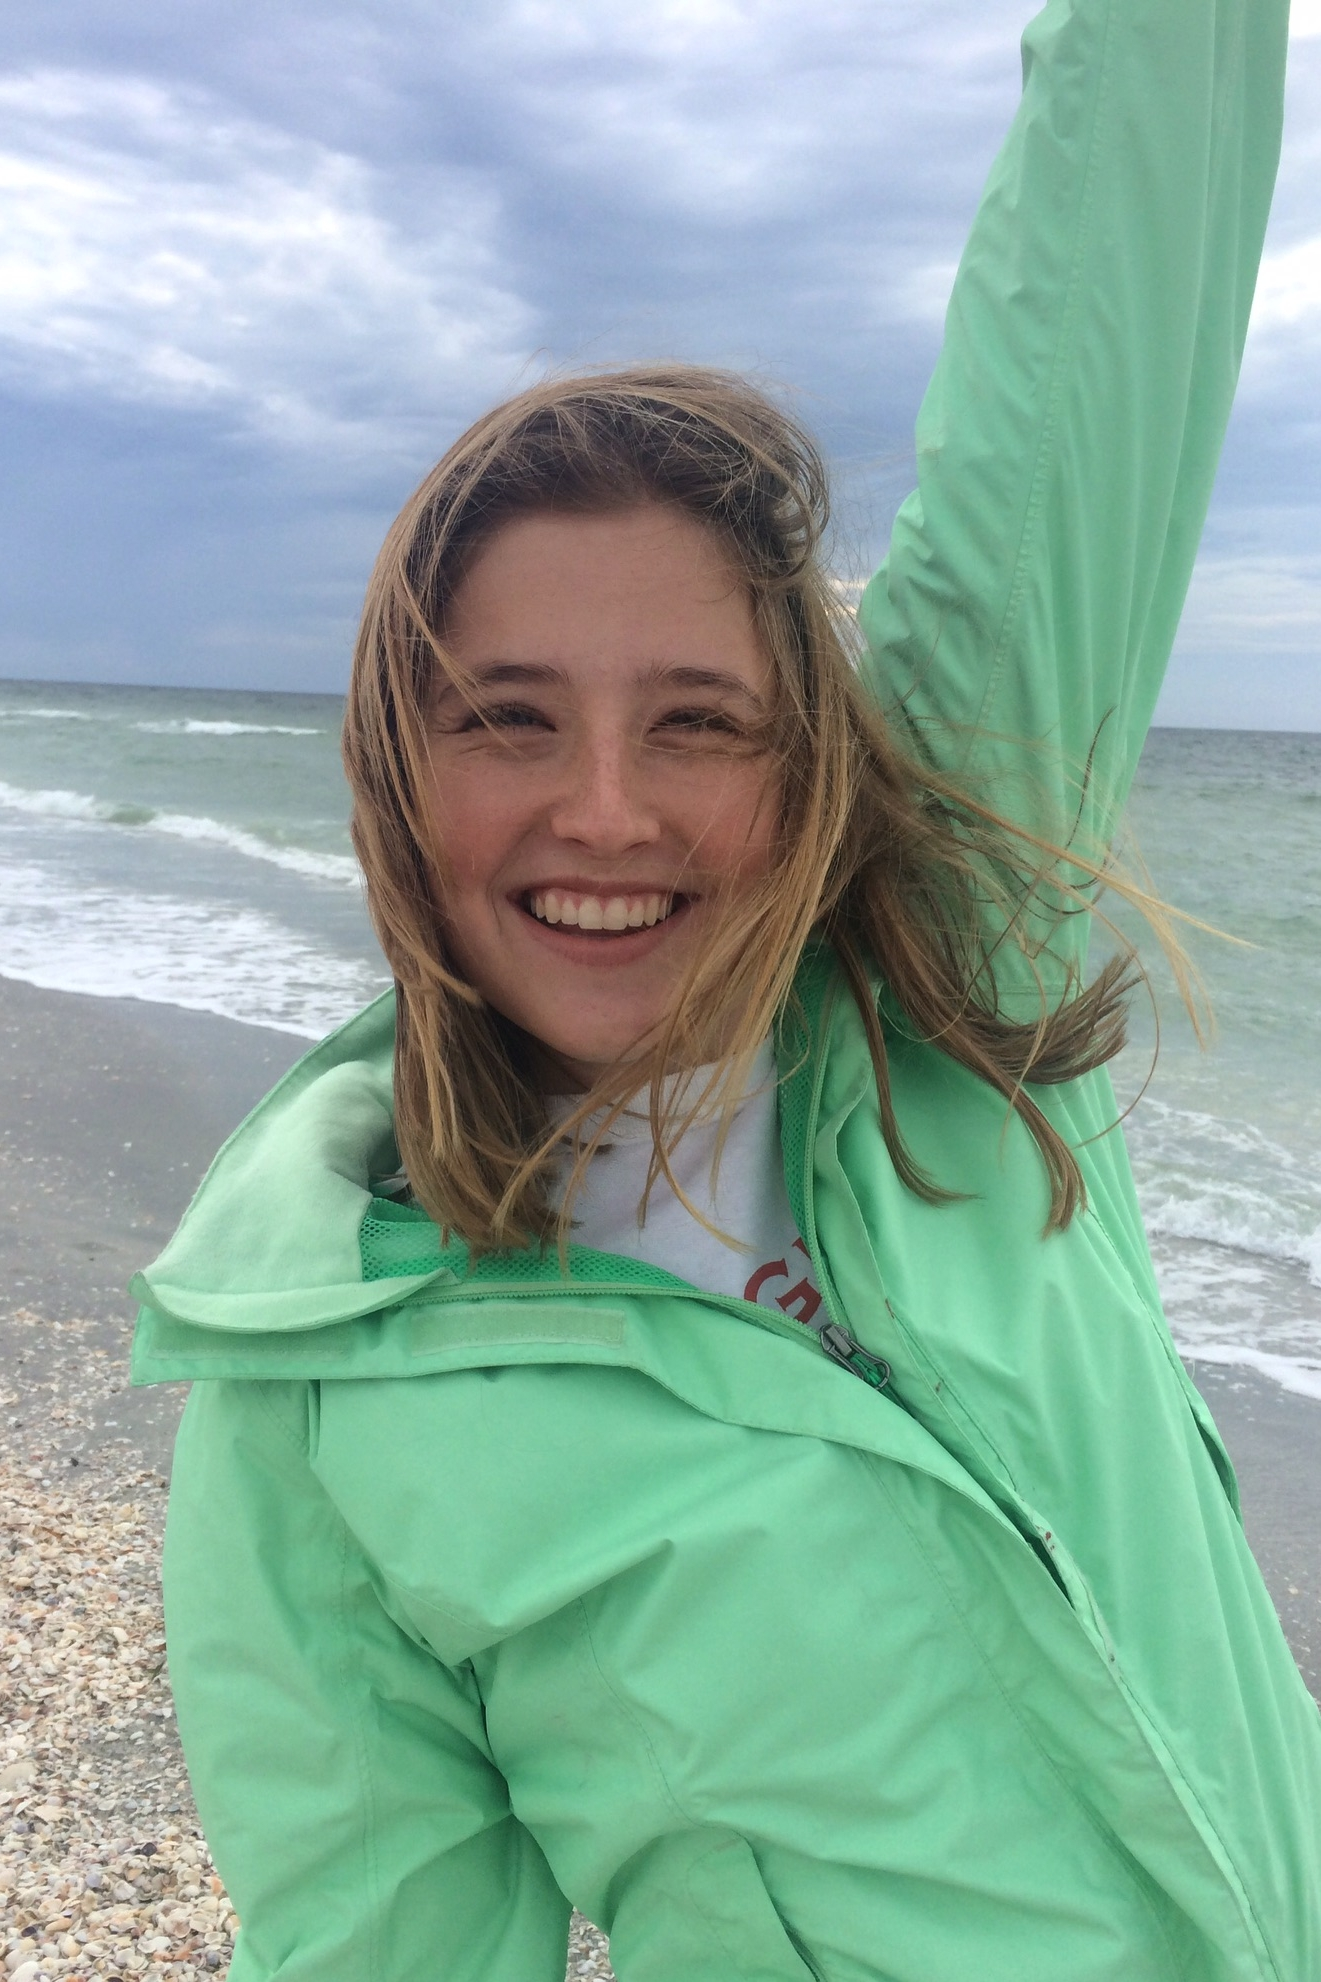 Isabel Draper - EnglishAtlanta, Georgia